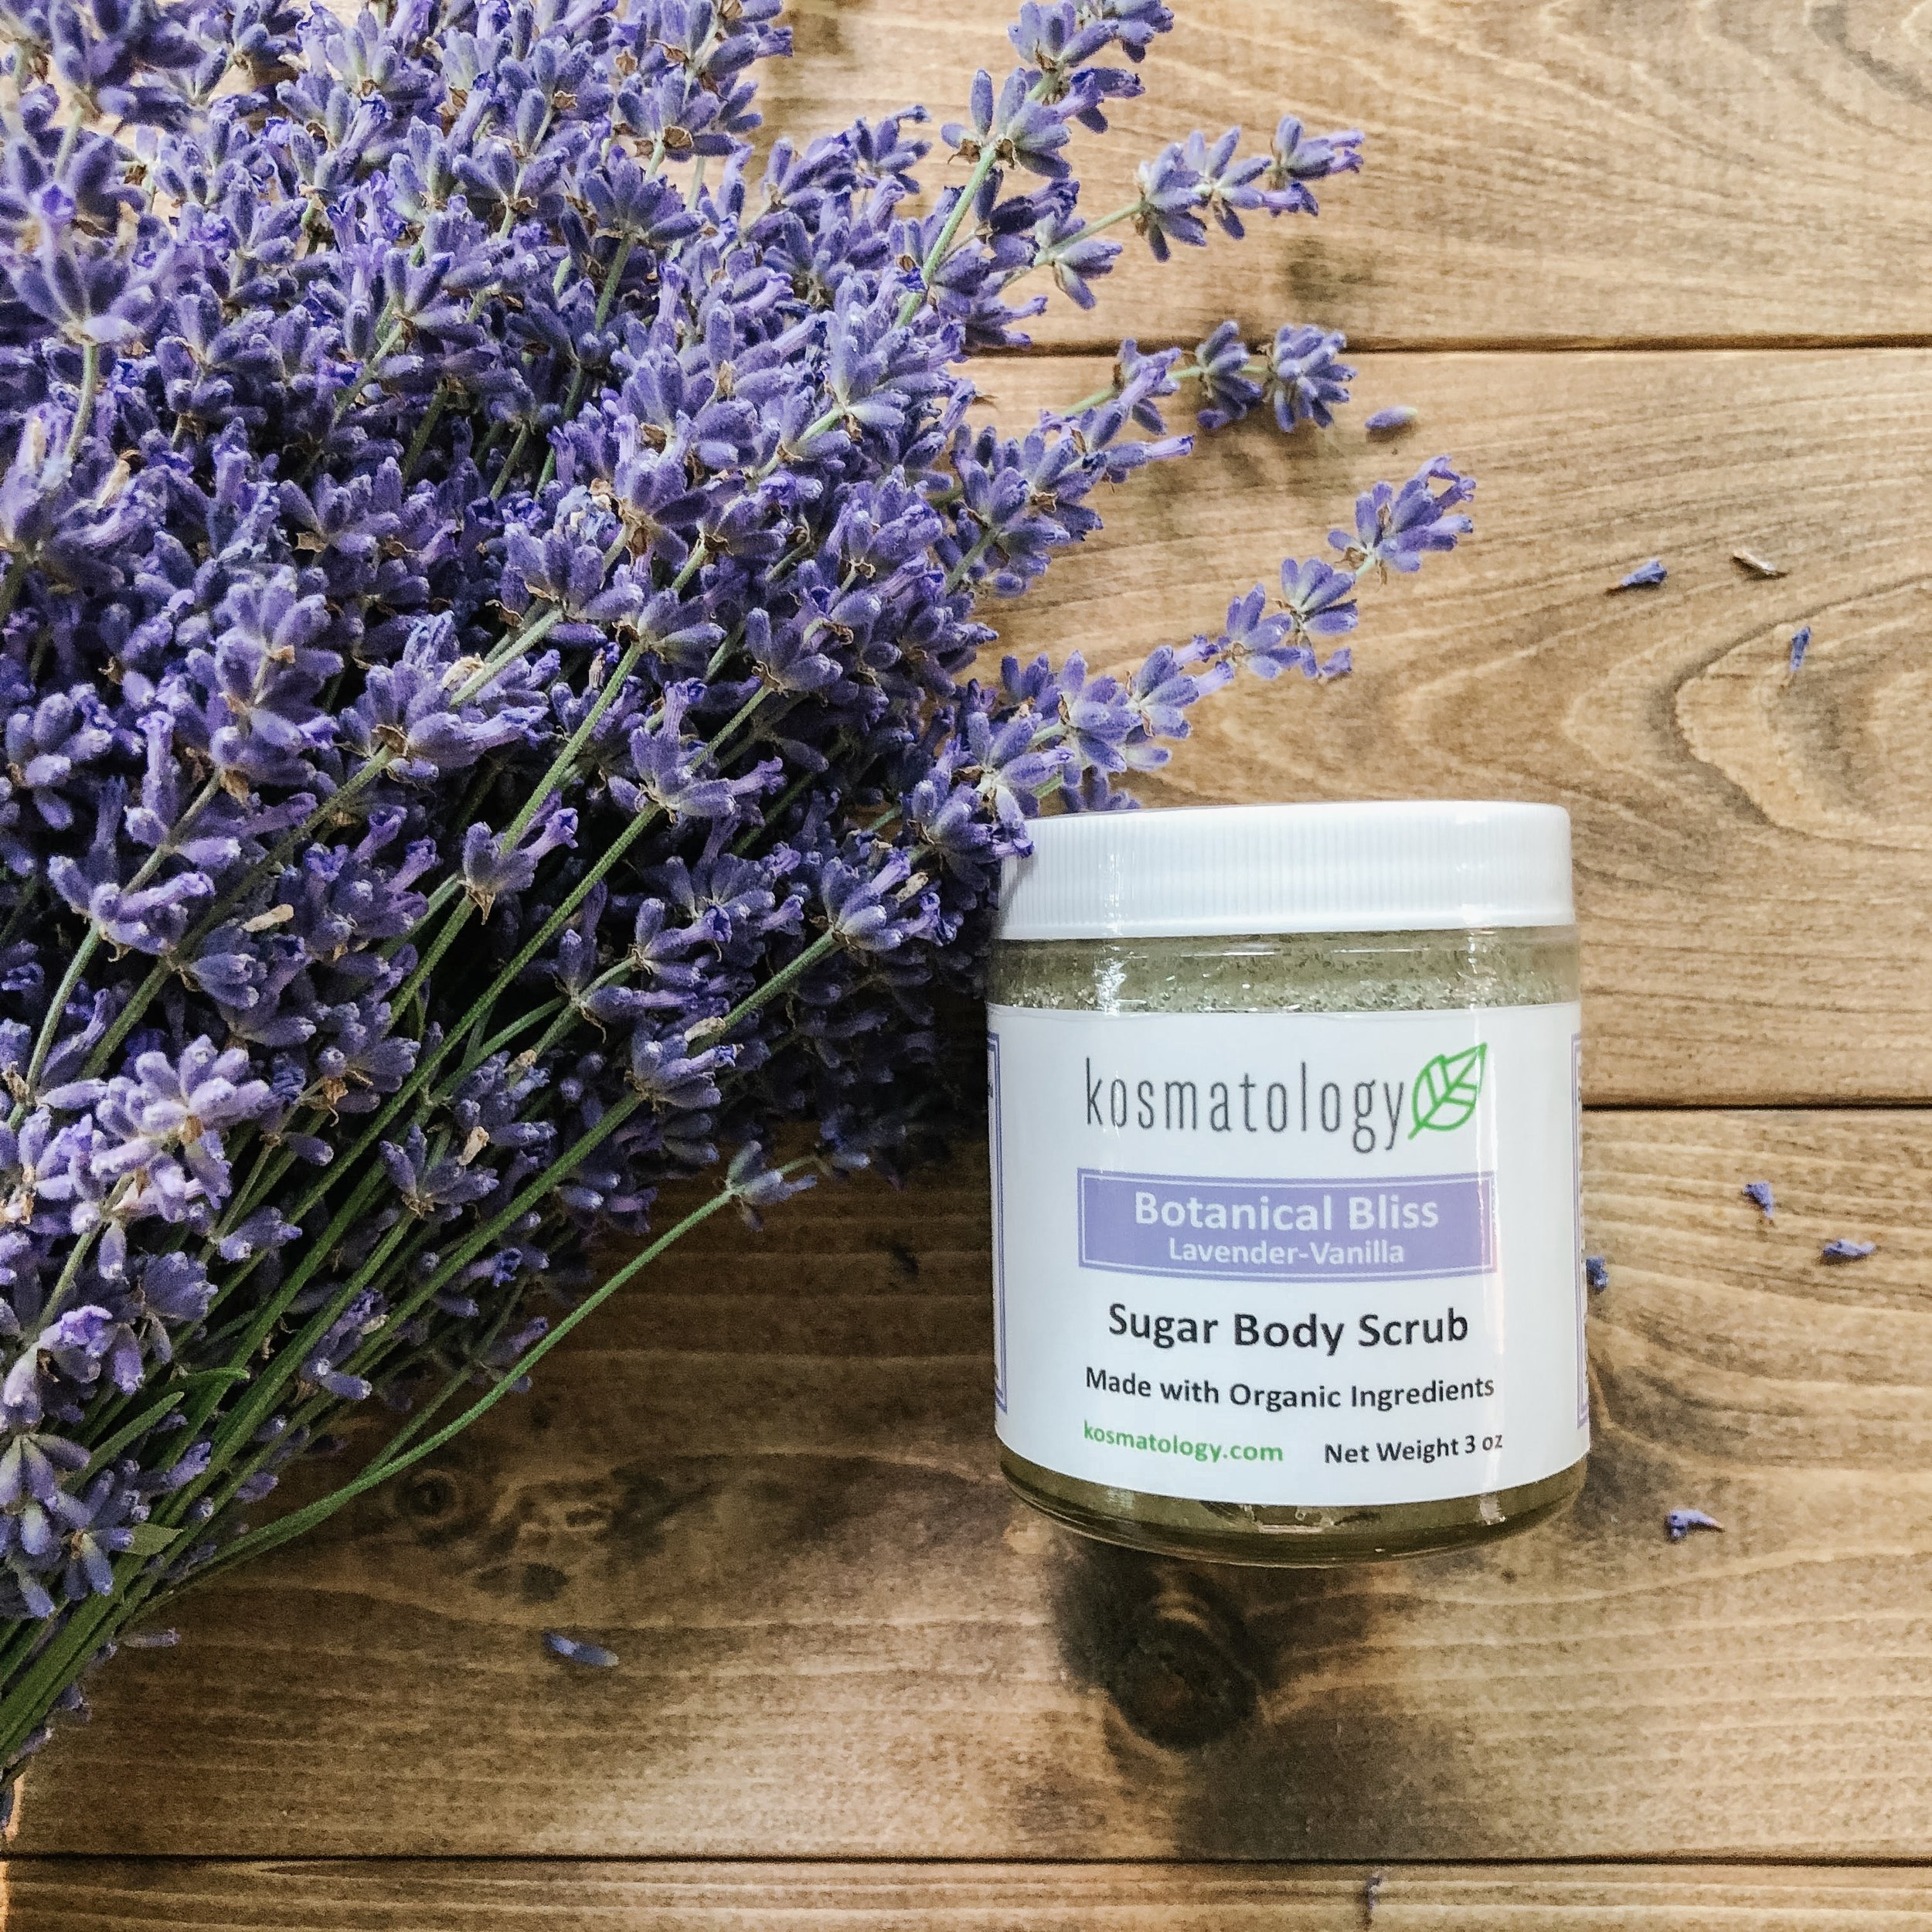 Botanical Bliss Sugar Scrub with lavender flowers